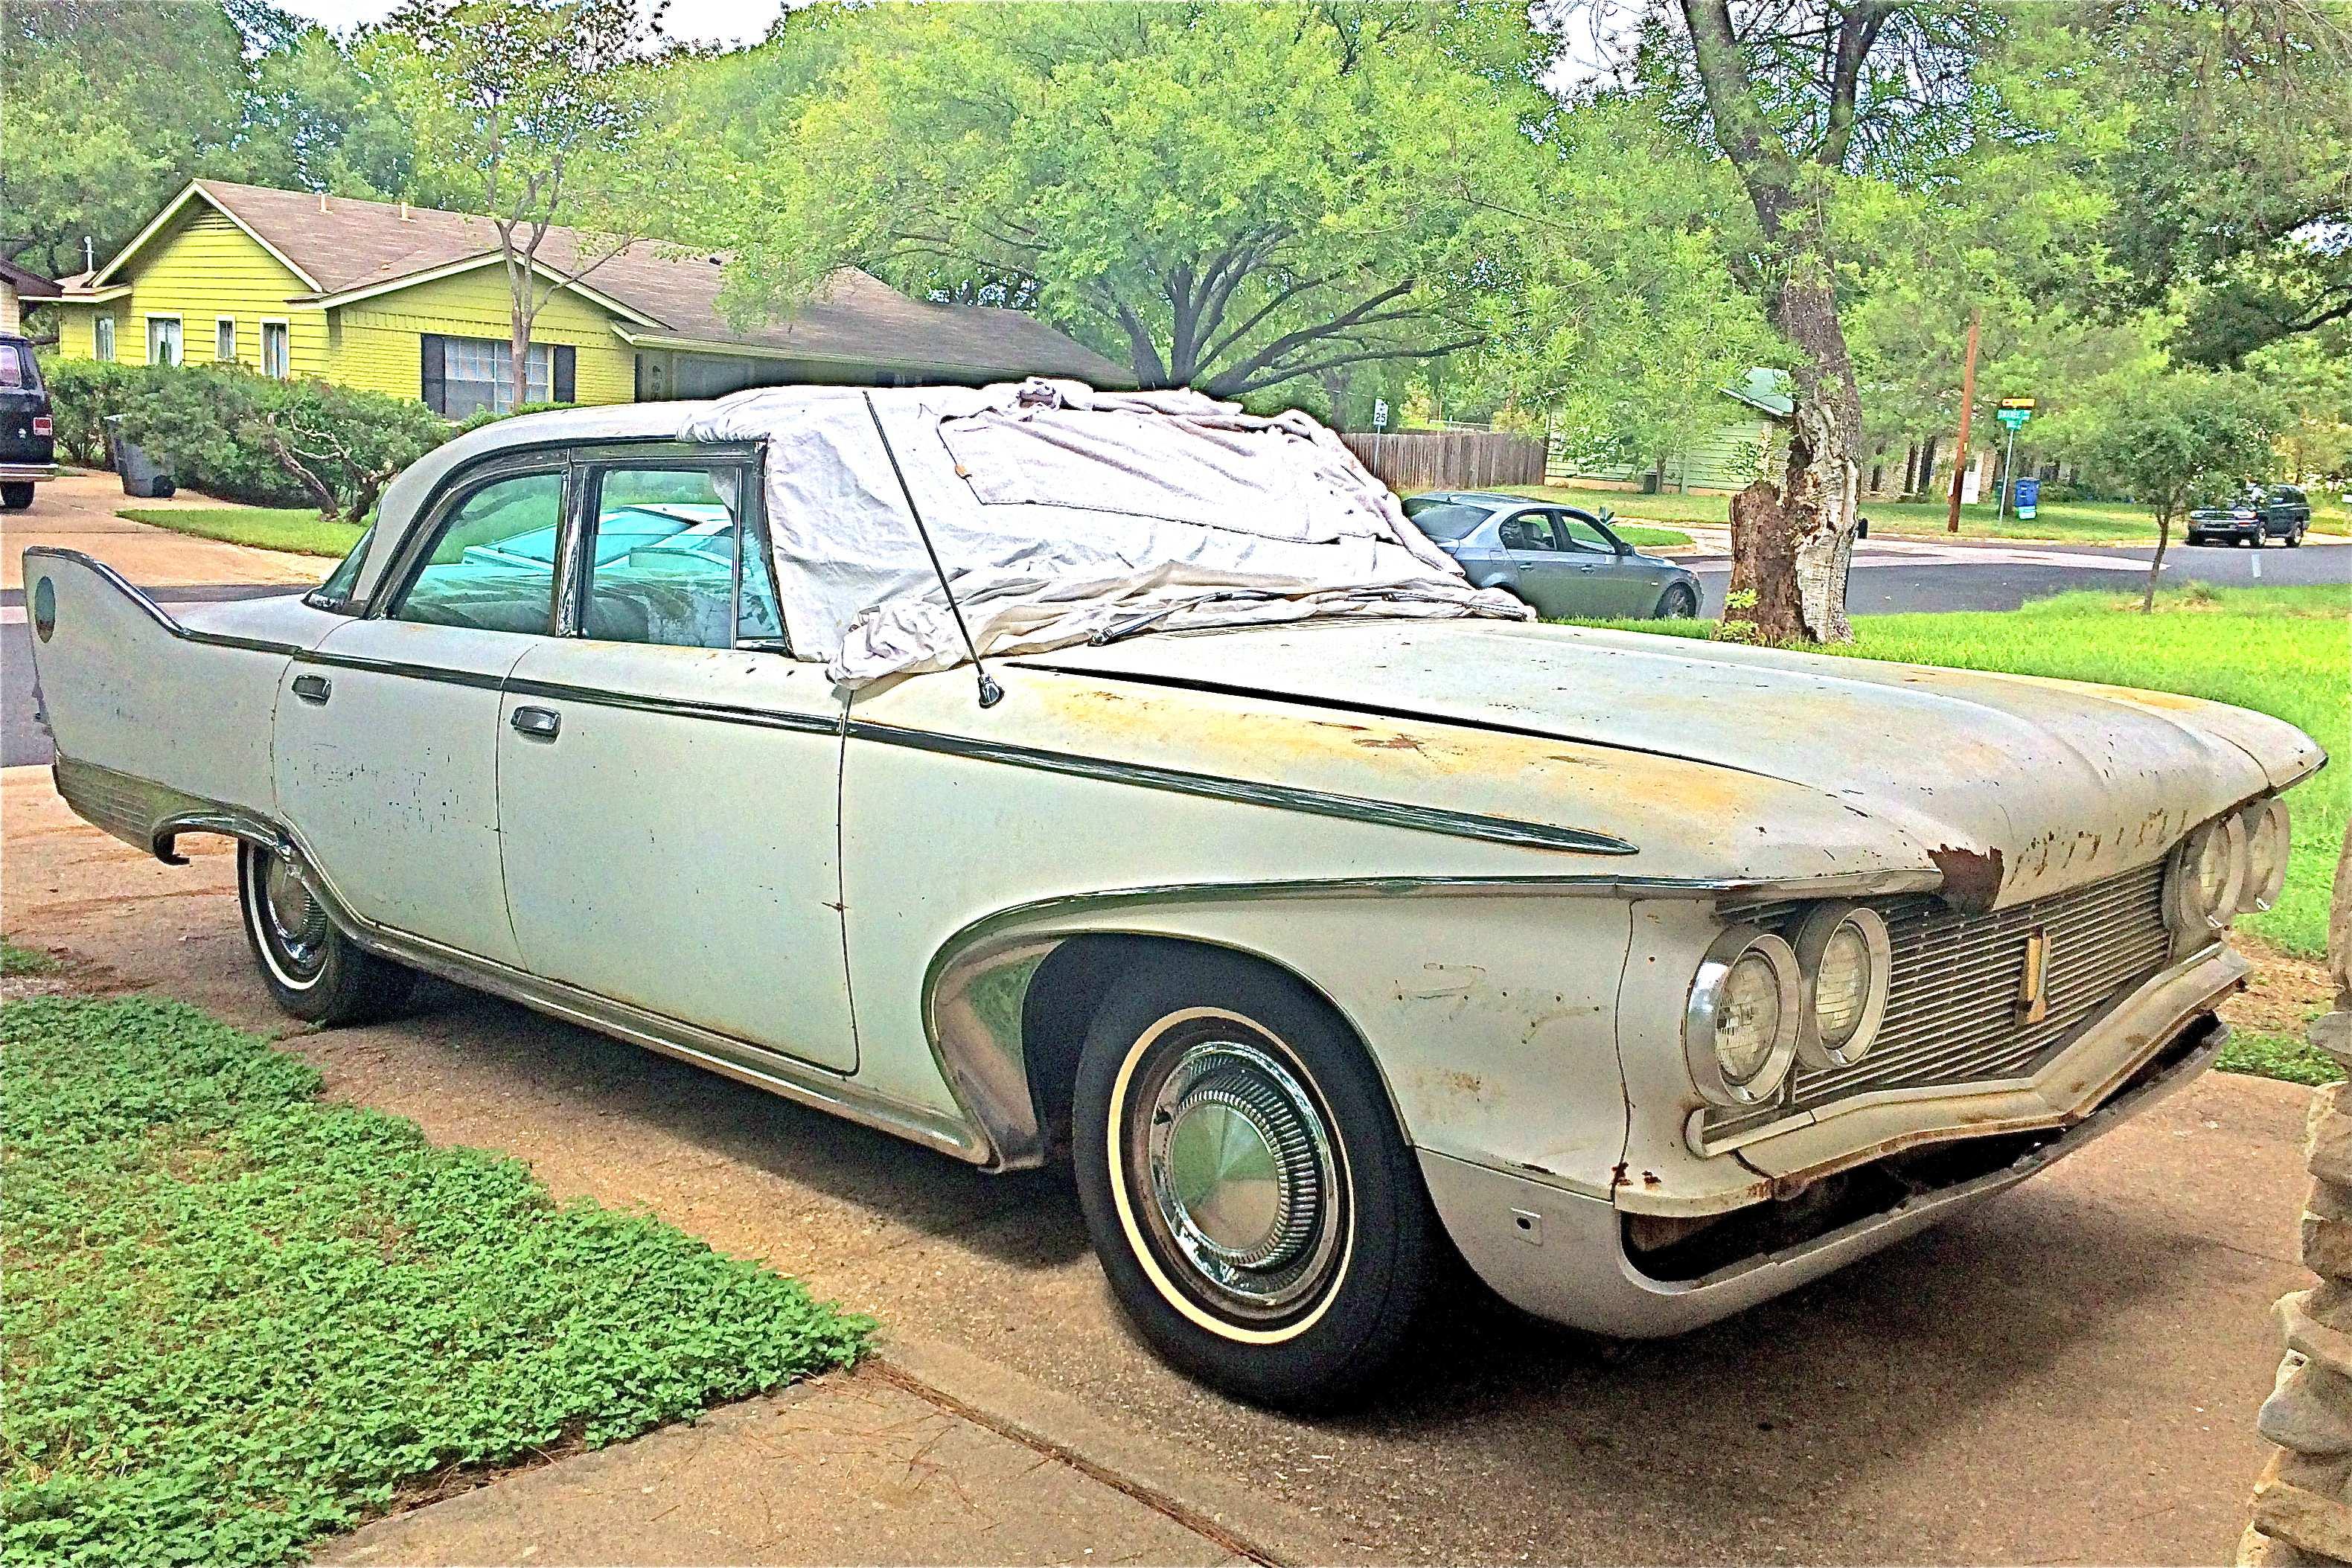 1960 Plymouth Fury Sedan Near Highland Mall Atx Car Pictures Valiant For Sale